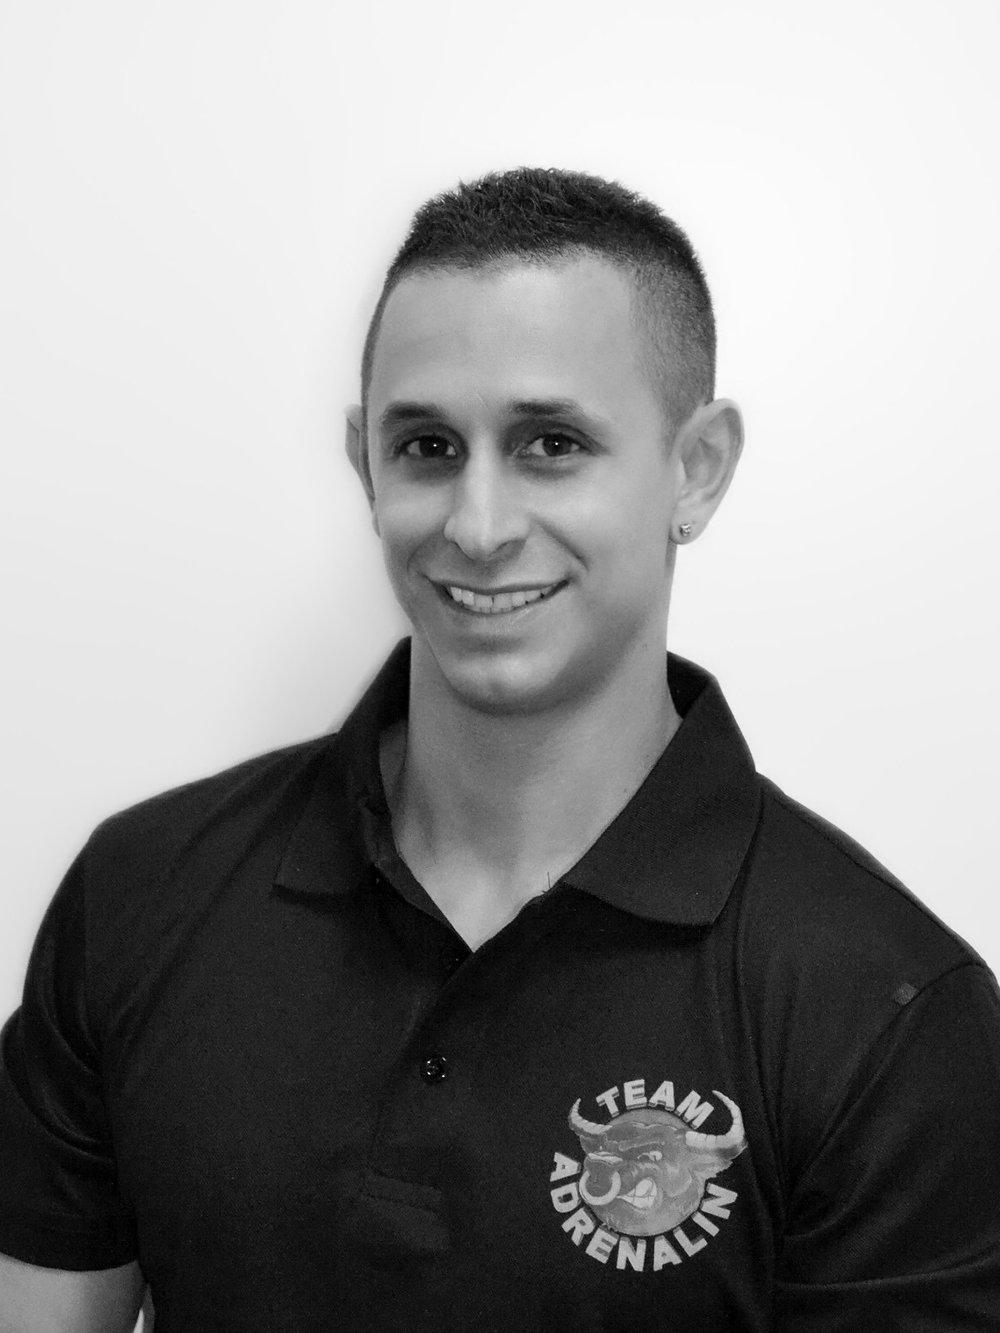 Steve Santo